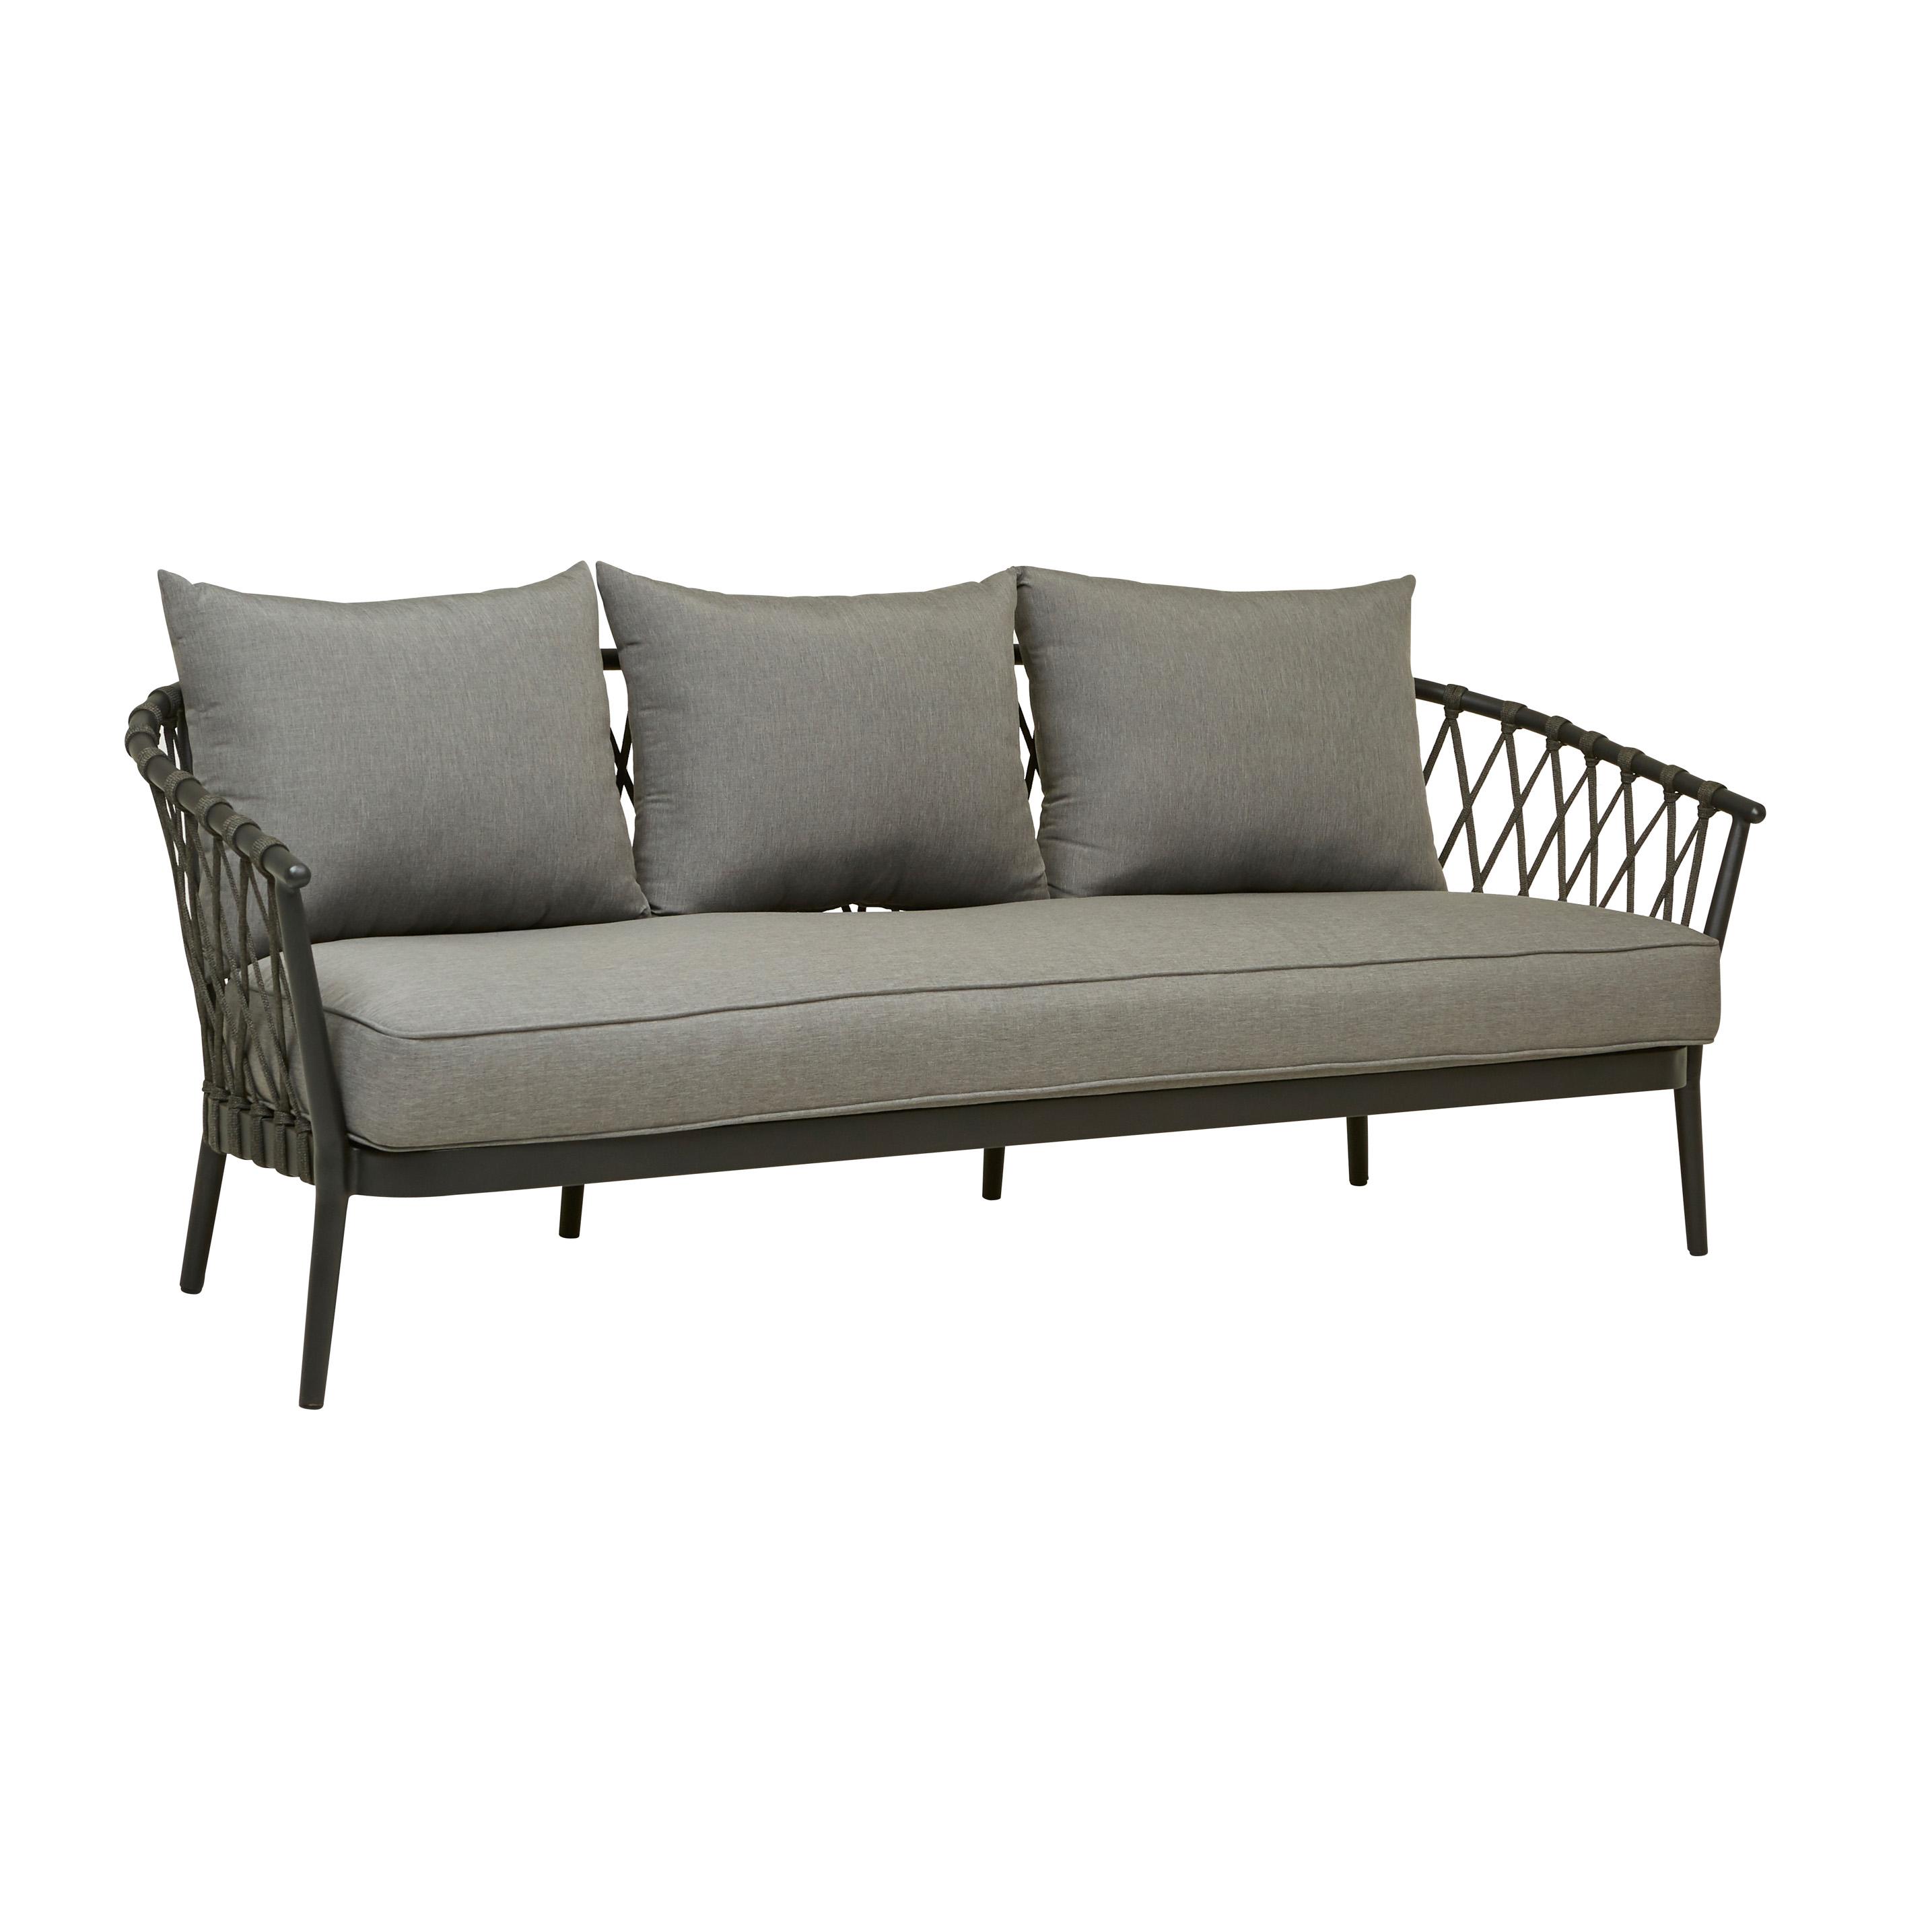 Furniture Hero-Images Sofas maui-three-seater-01